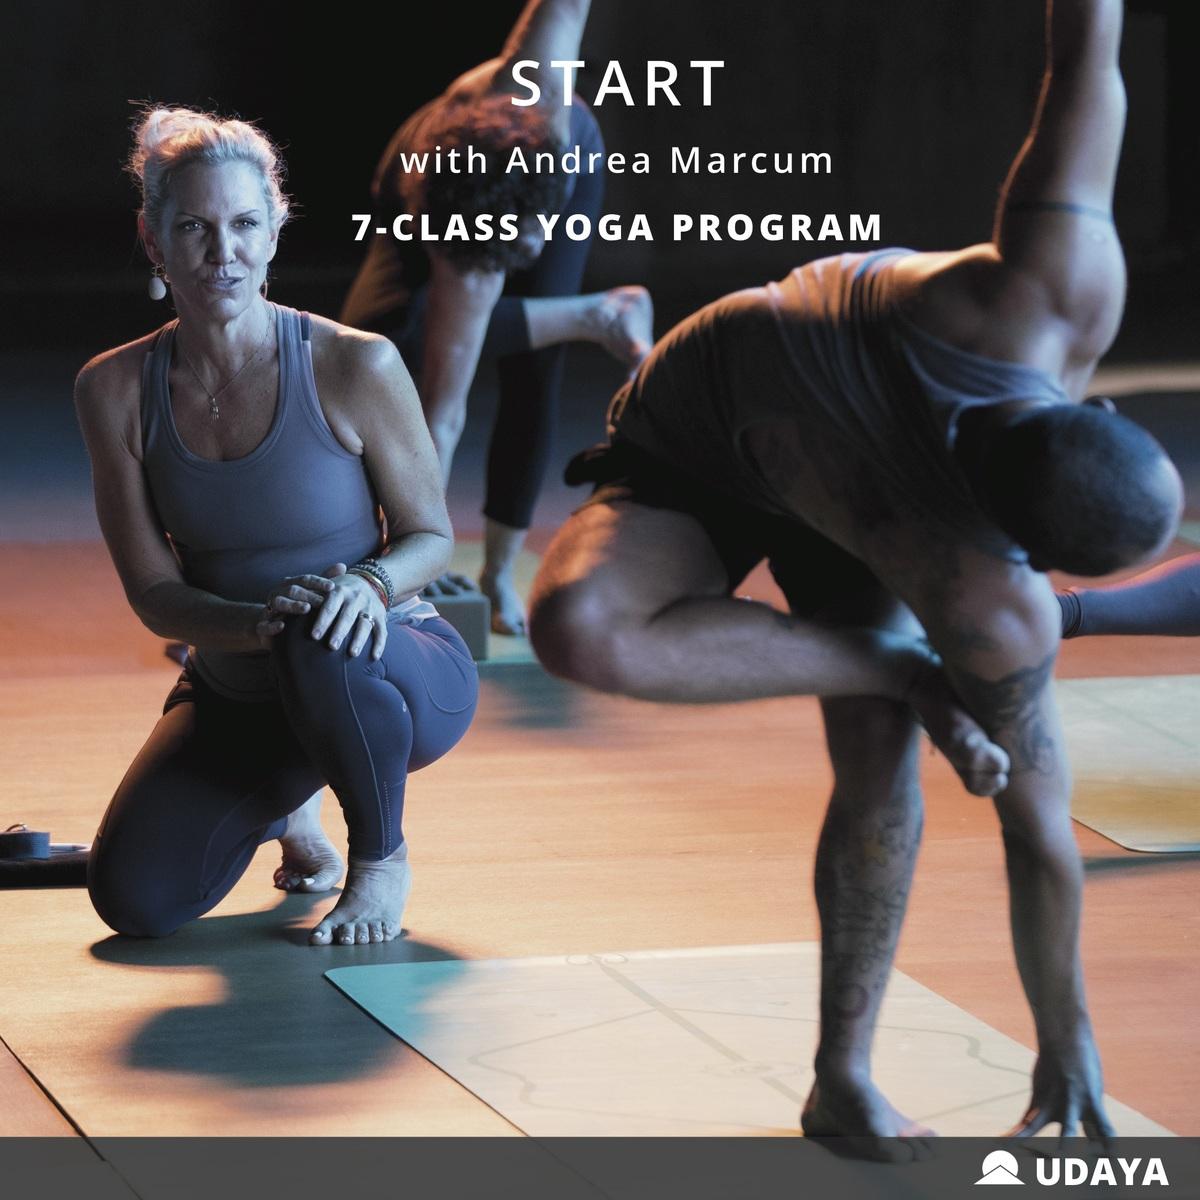 Week Long Program to START your OM